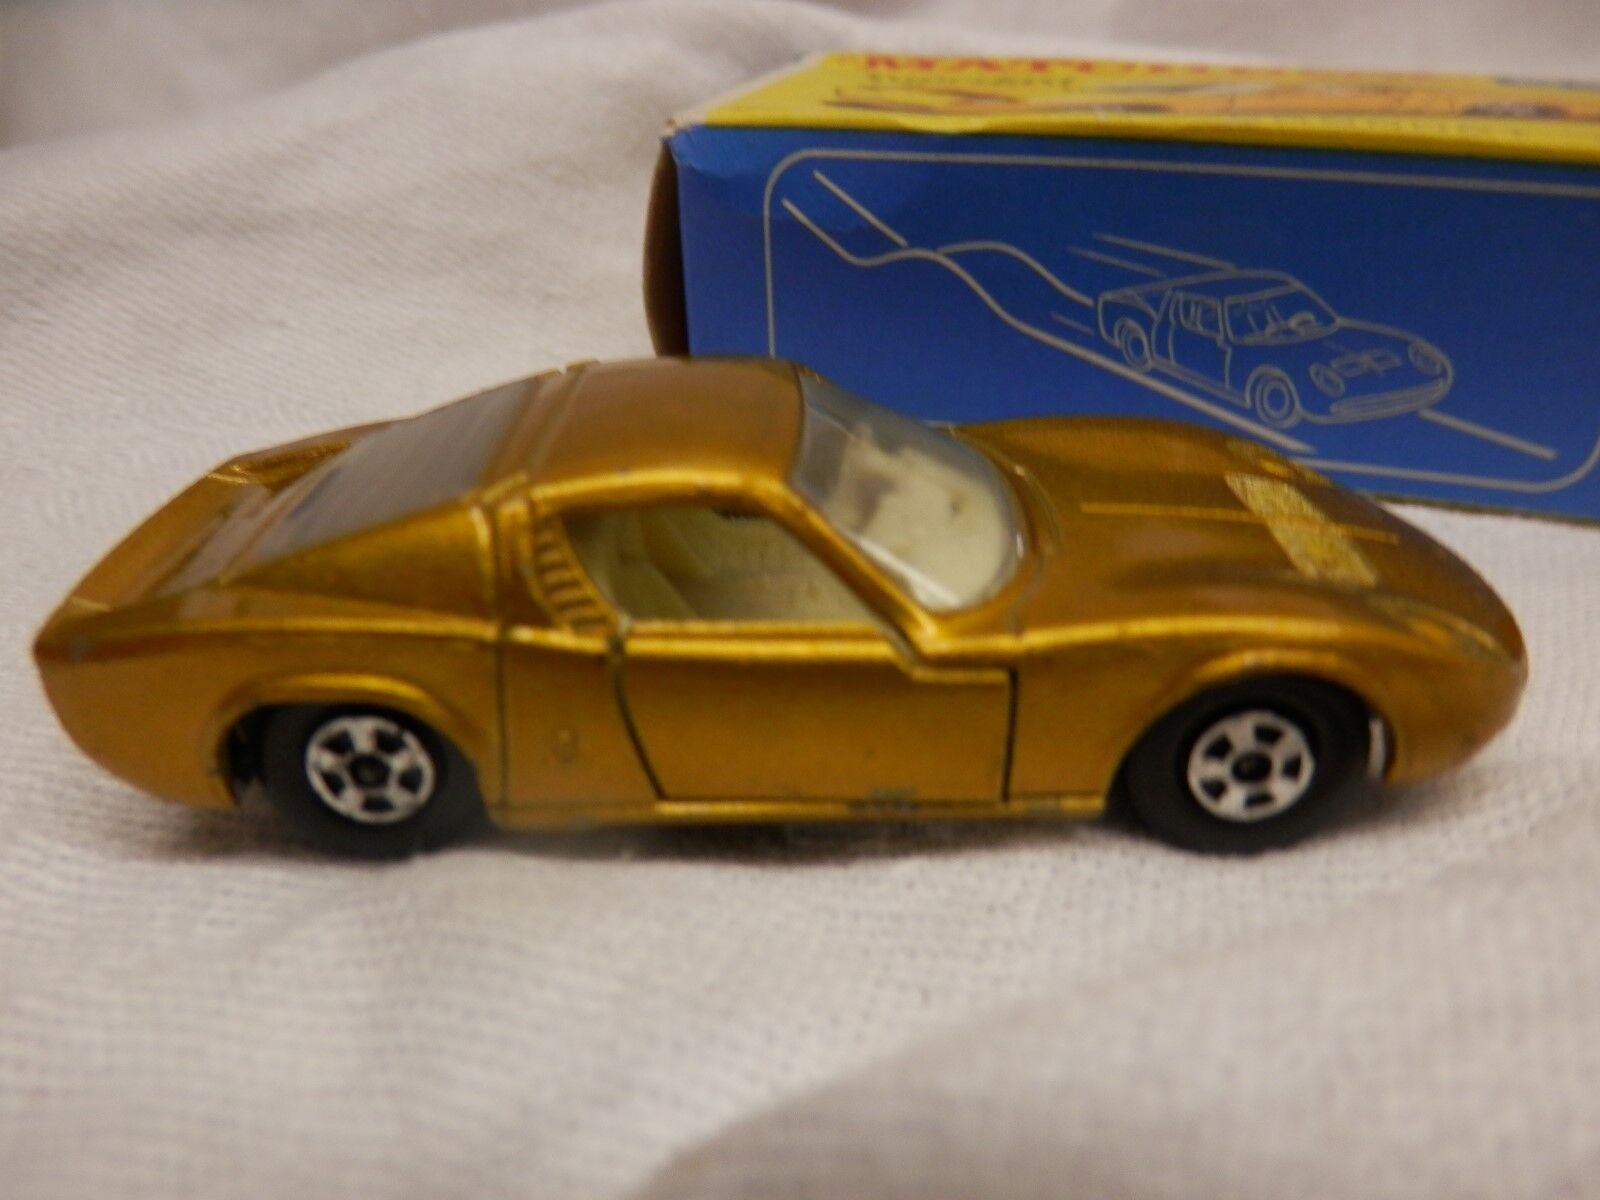 Matchbox 1969 Lamborghini Miura 1 64 Diecast Car Series Lesney No.33 gold